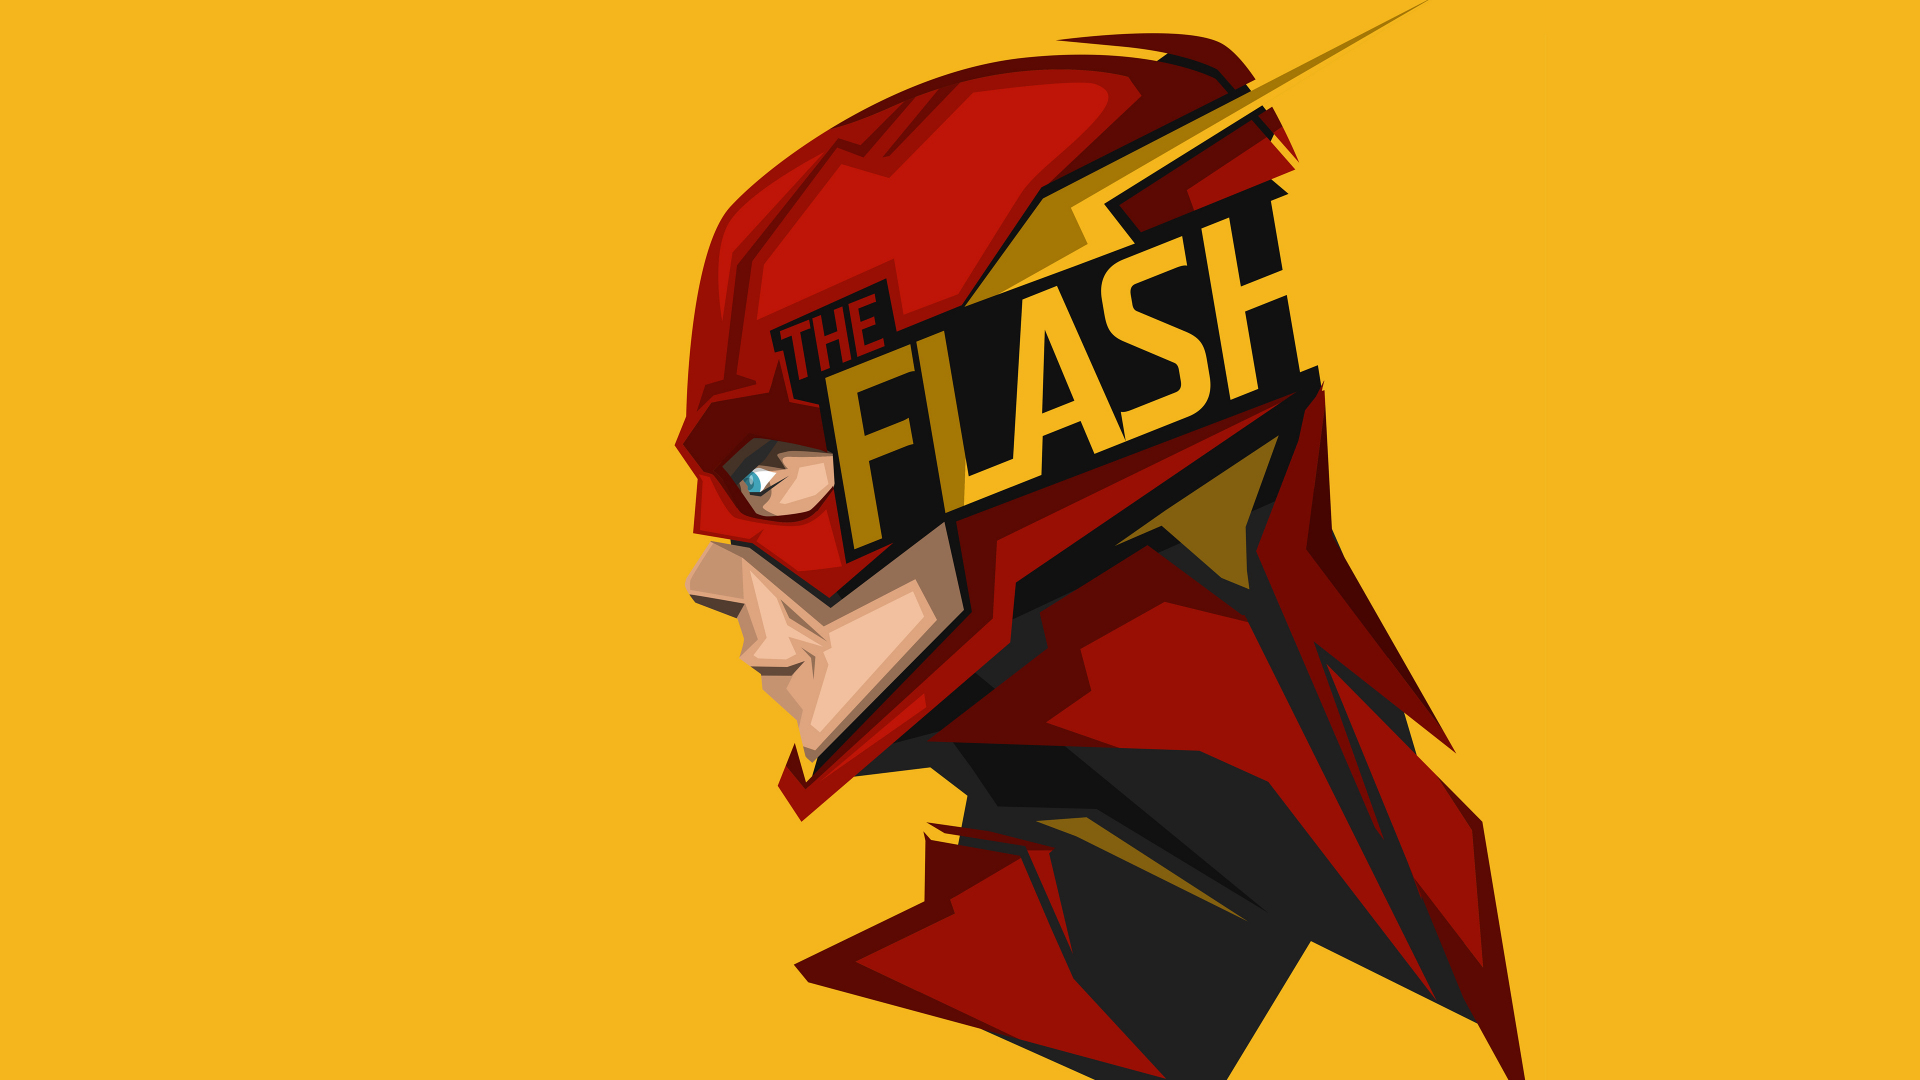 Download 1920x1080 Wallpaper The Flash Minimal Artwork Full Hd